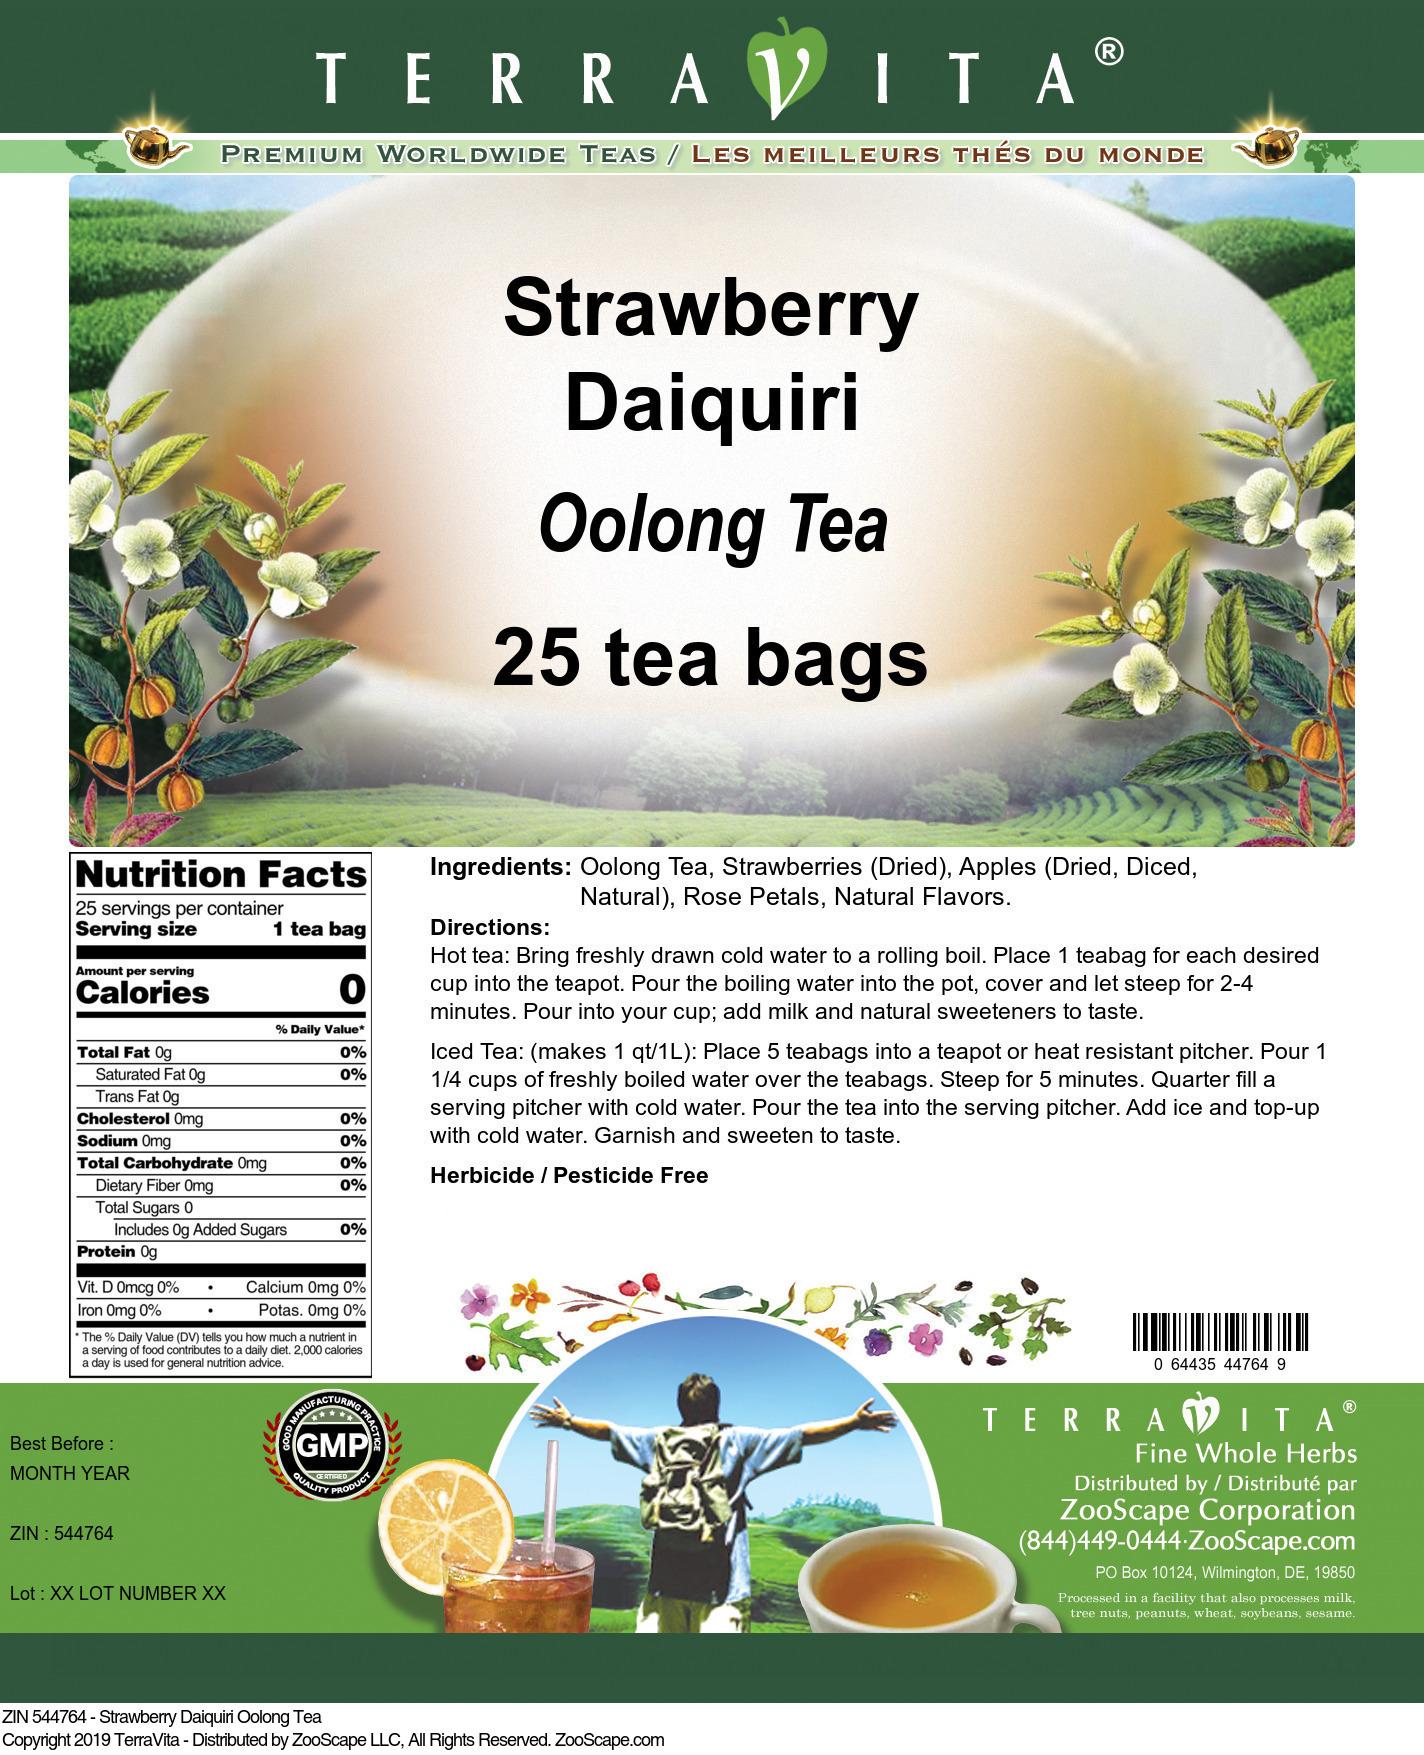 Strawberry Daiquiri Oolong Tea